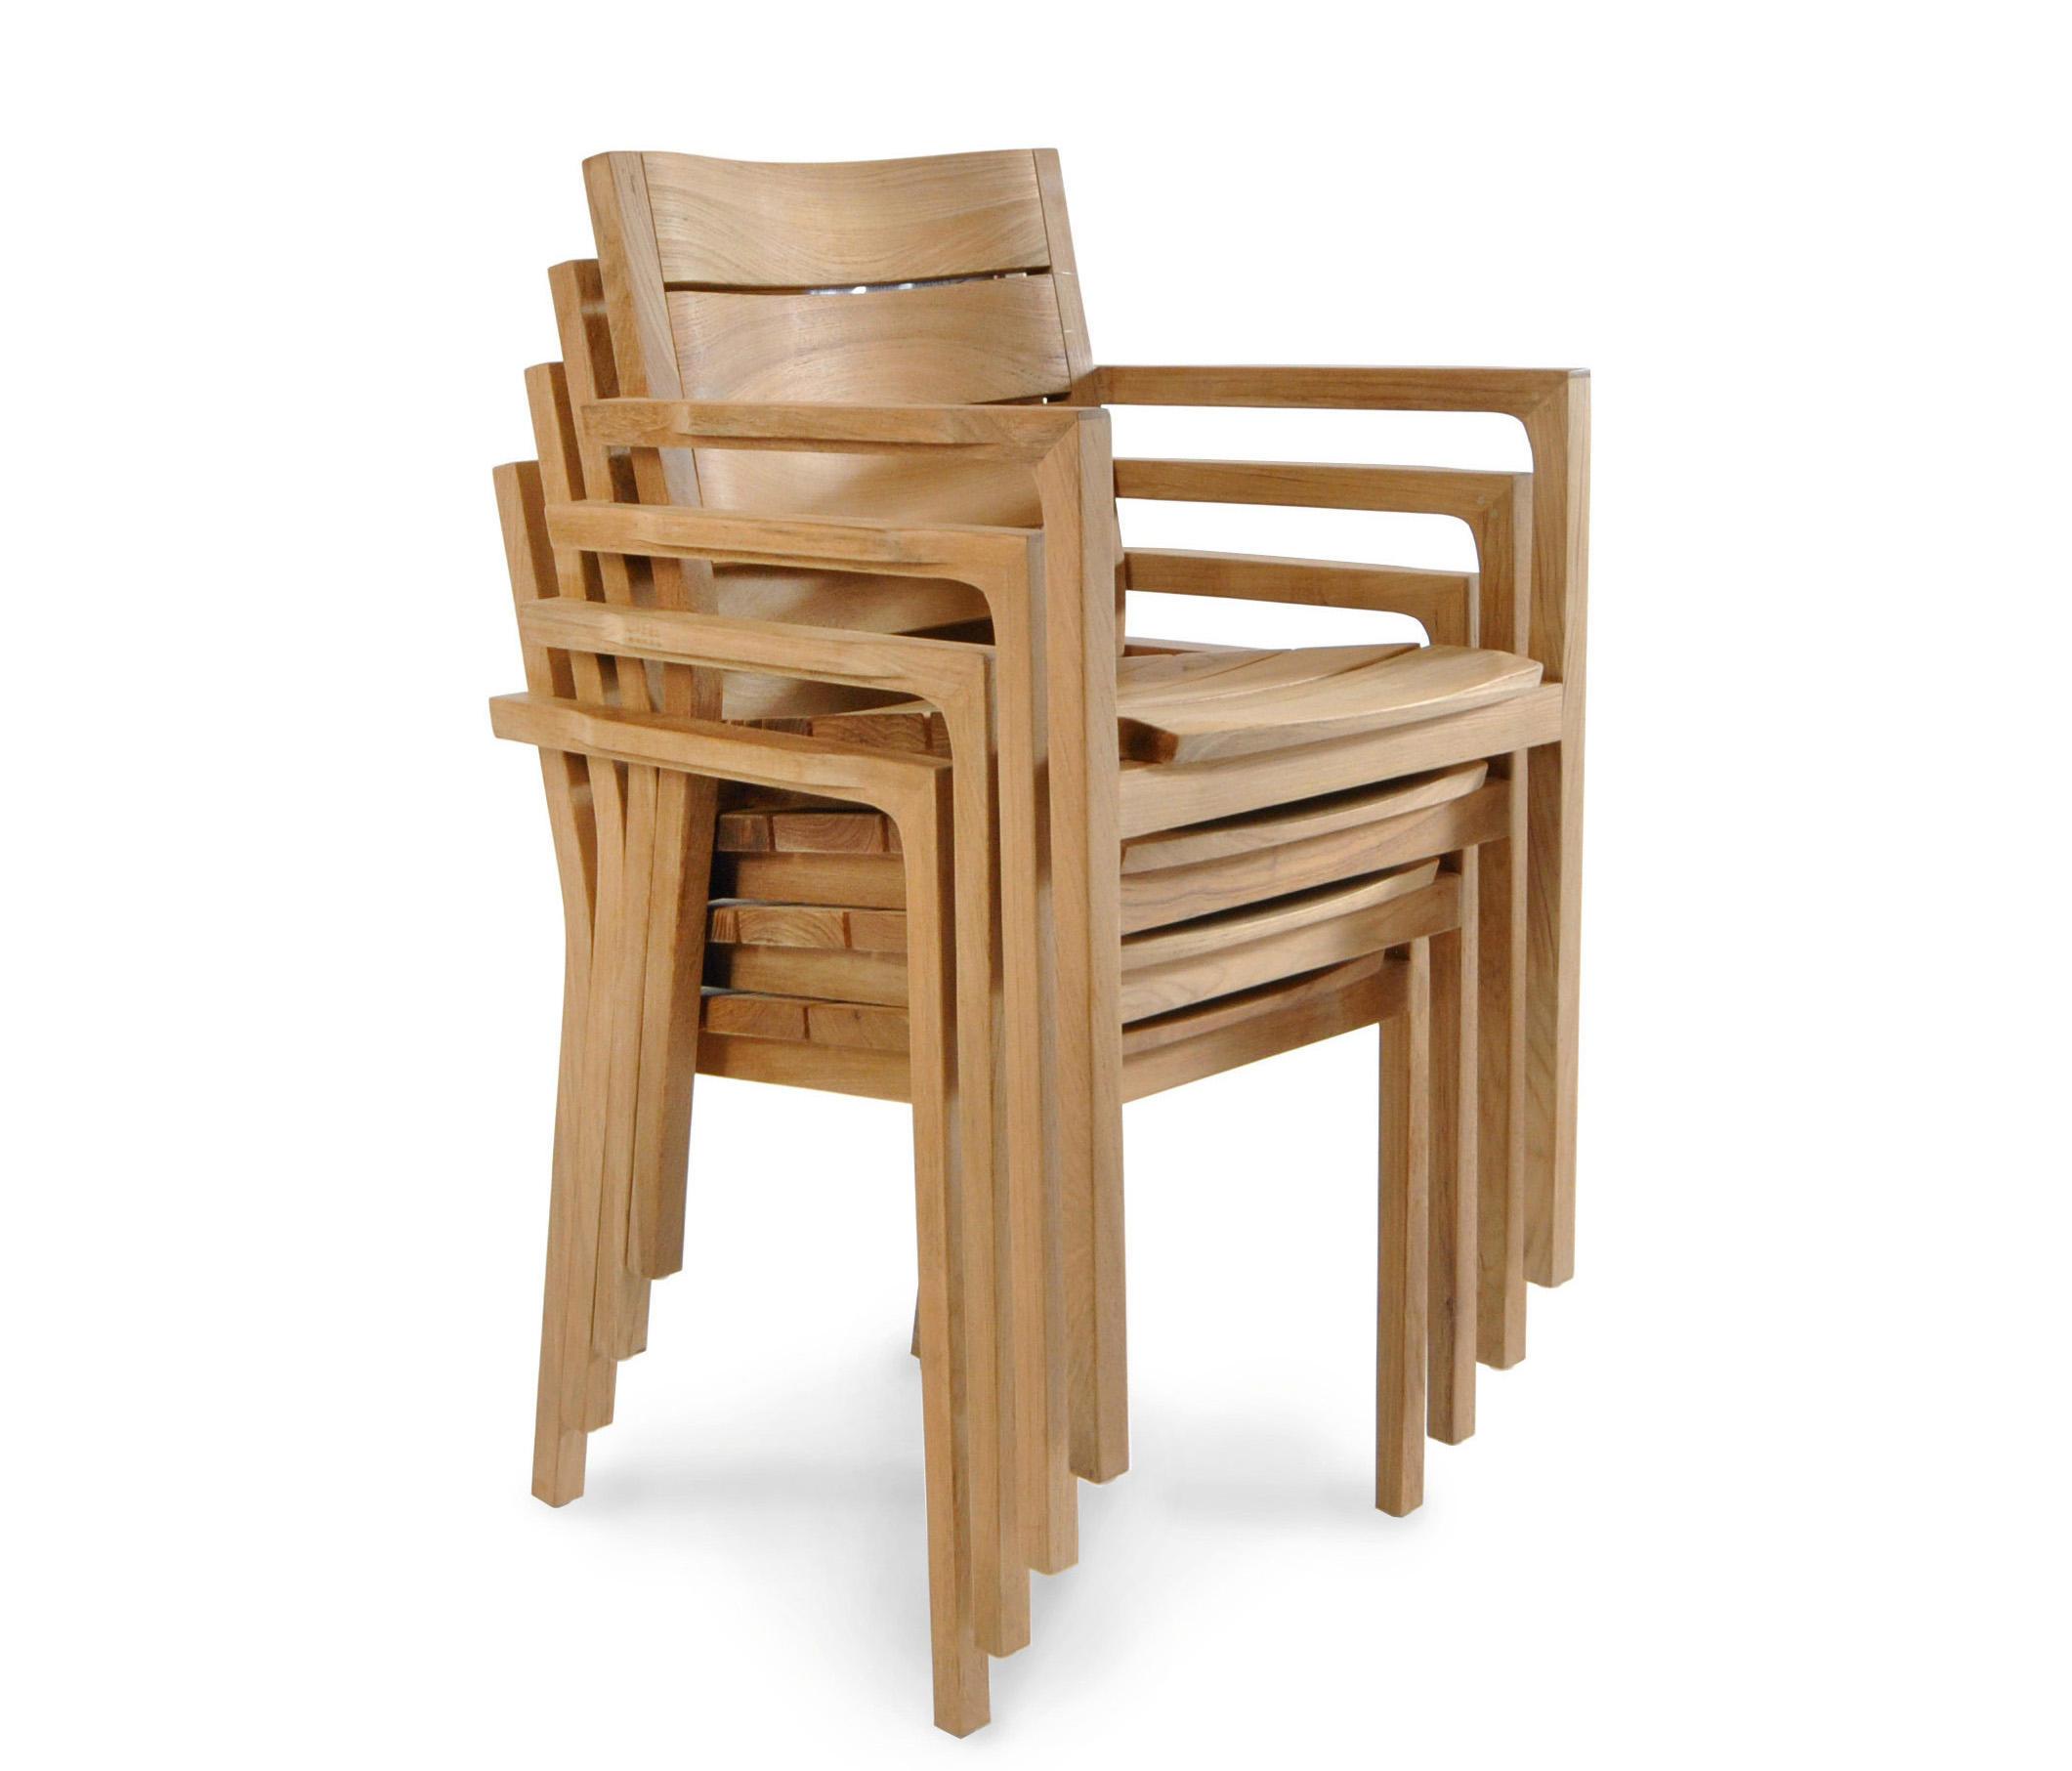 Fischer Moebel june chair garden chairs from fischer möbel architonic